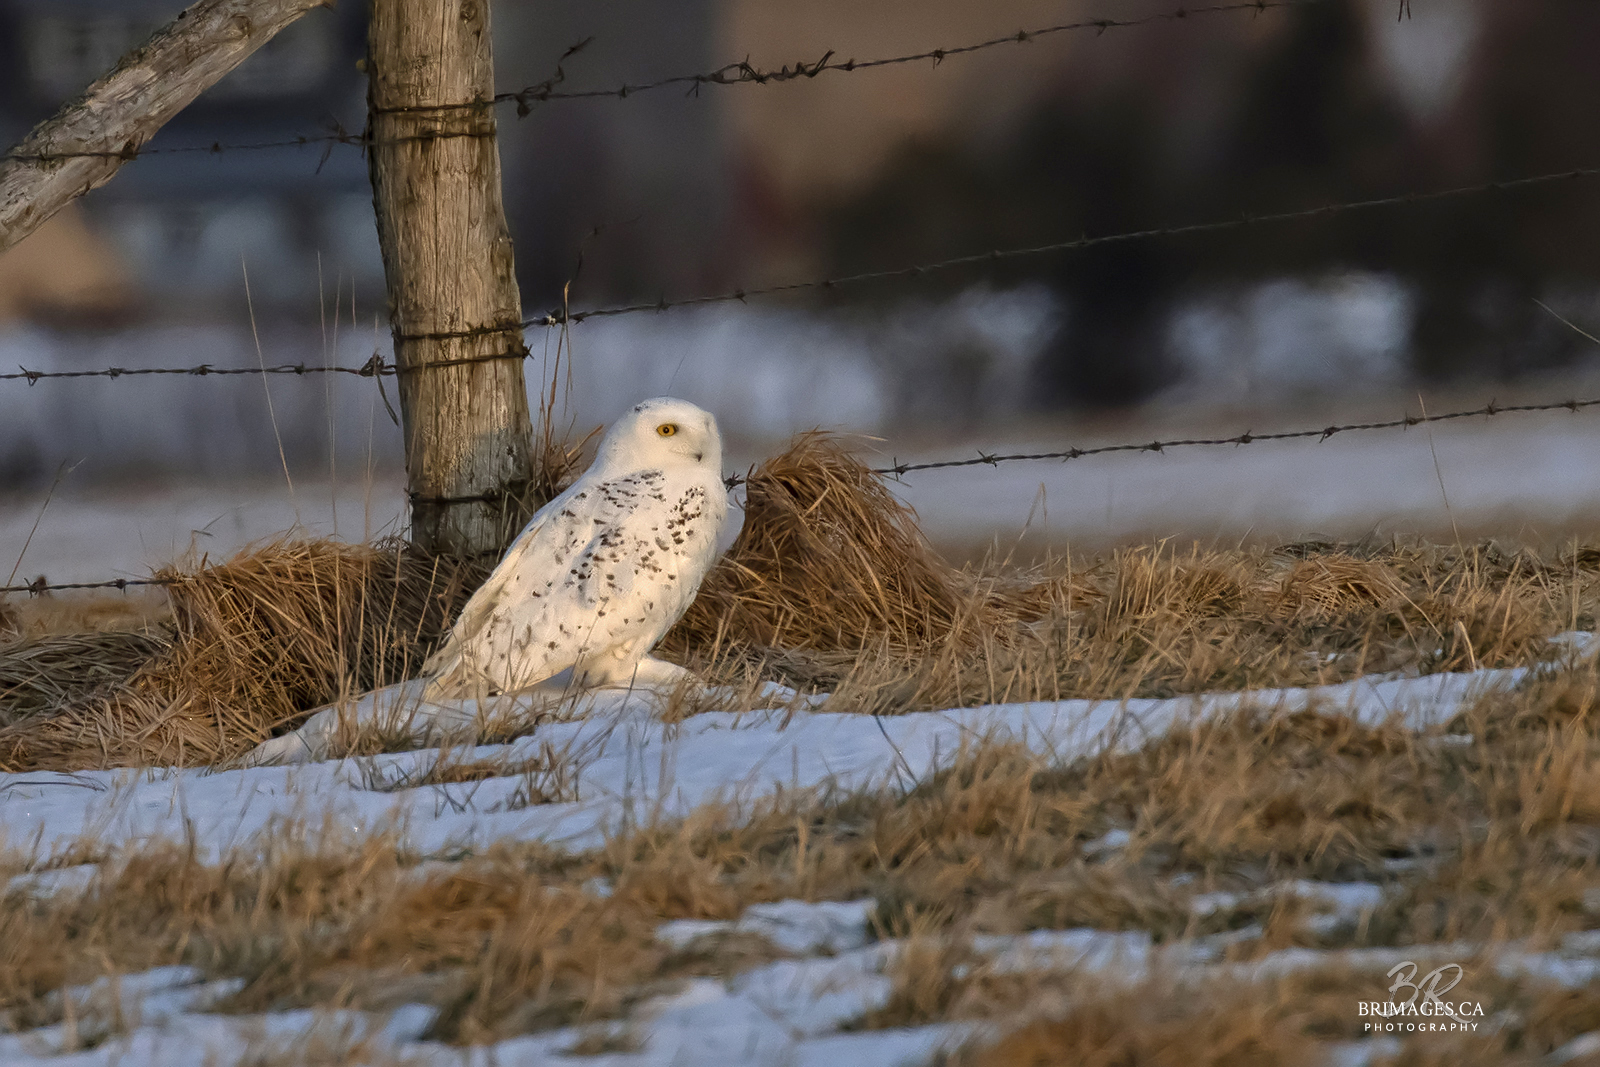 snowy-owl-ground-new-brunswick-BRimages.ca